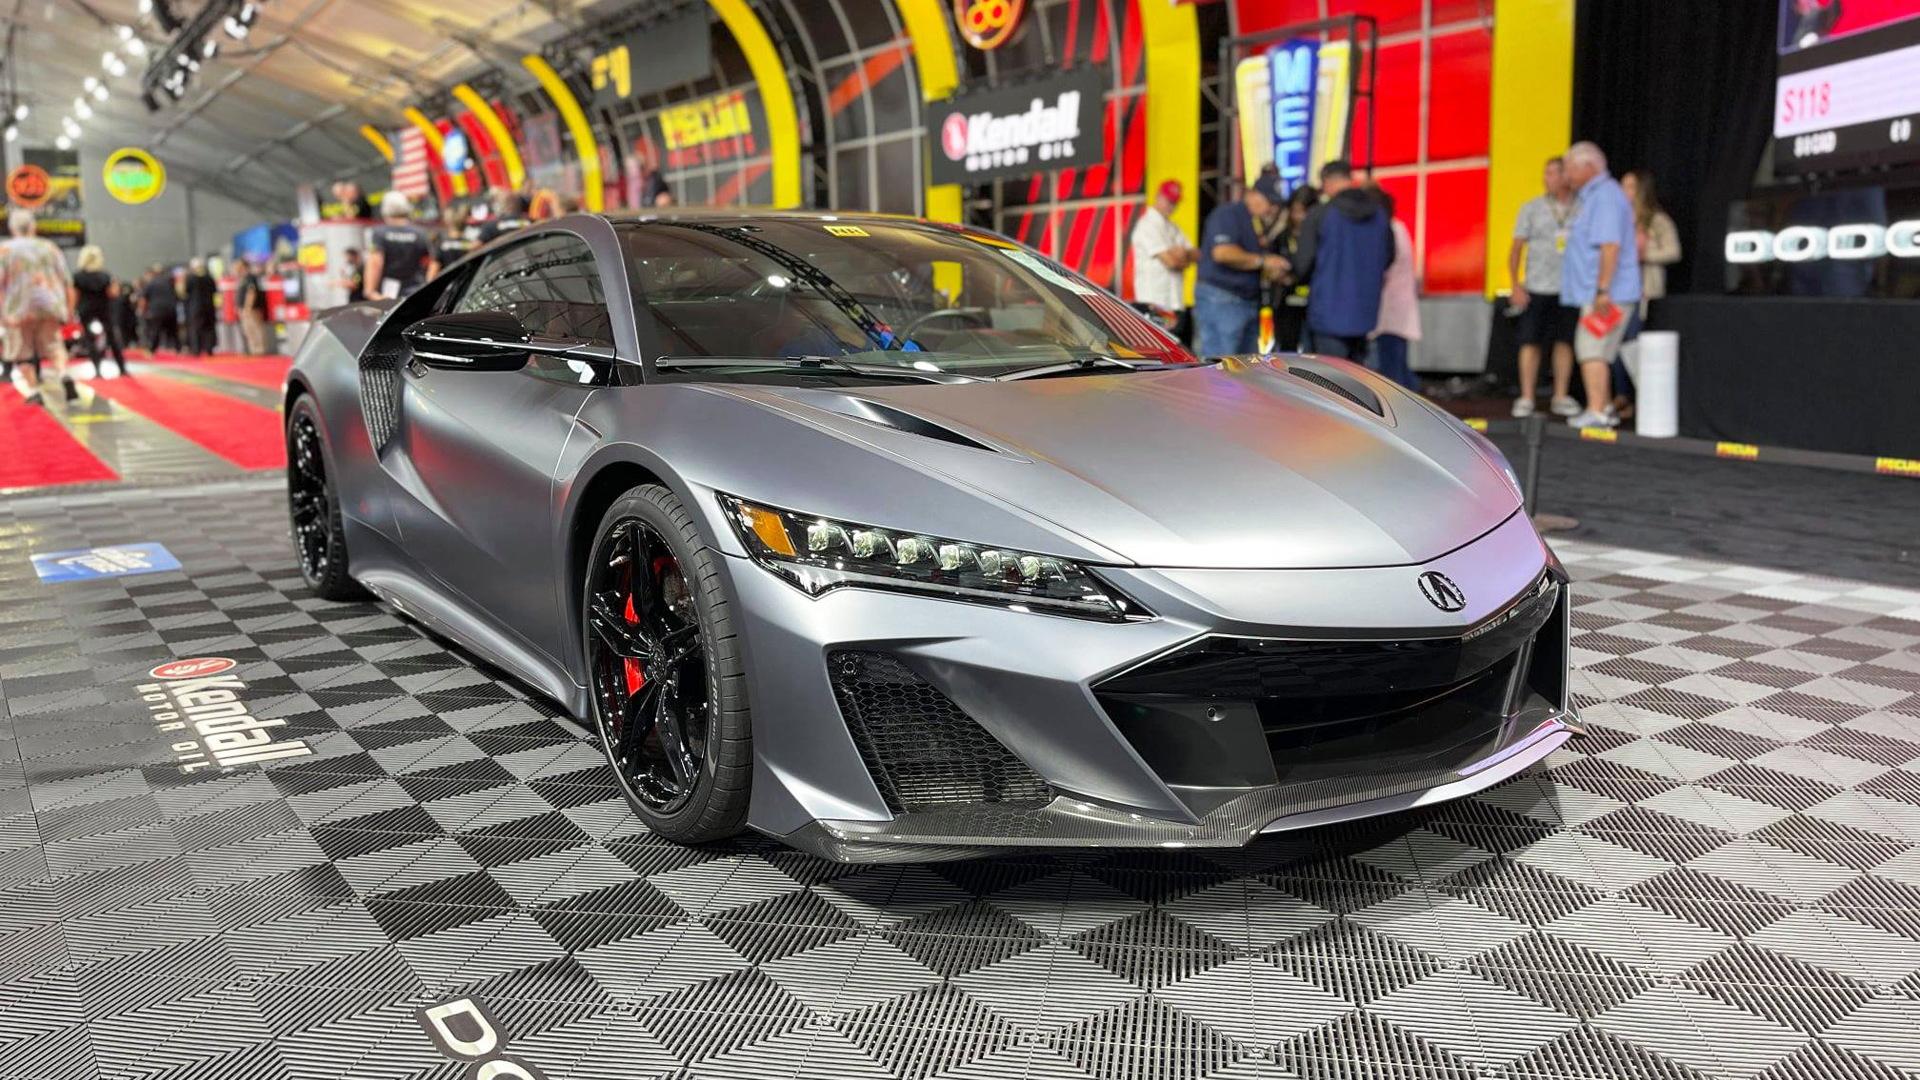 2022 Acura NSX Type S at Mecum's 2021 Monterey Car Week sale